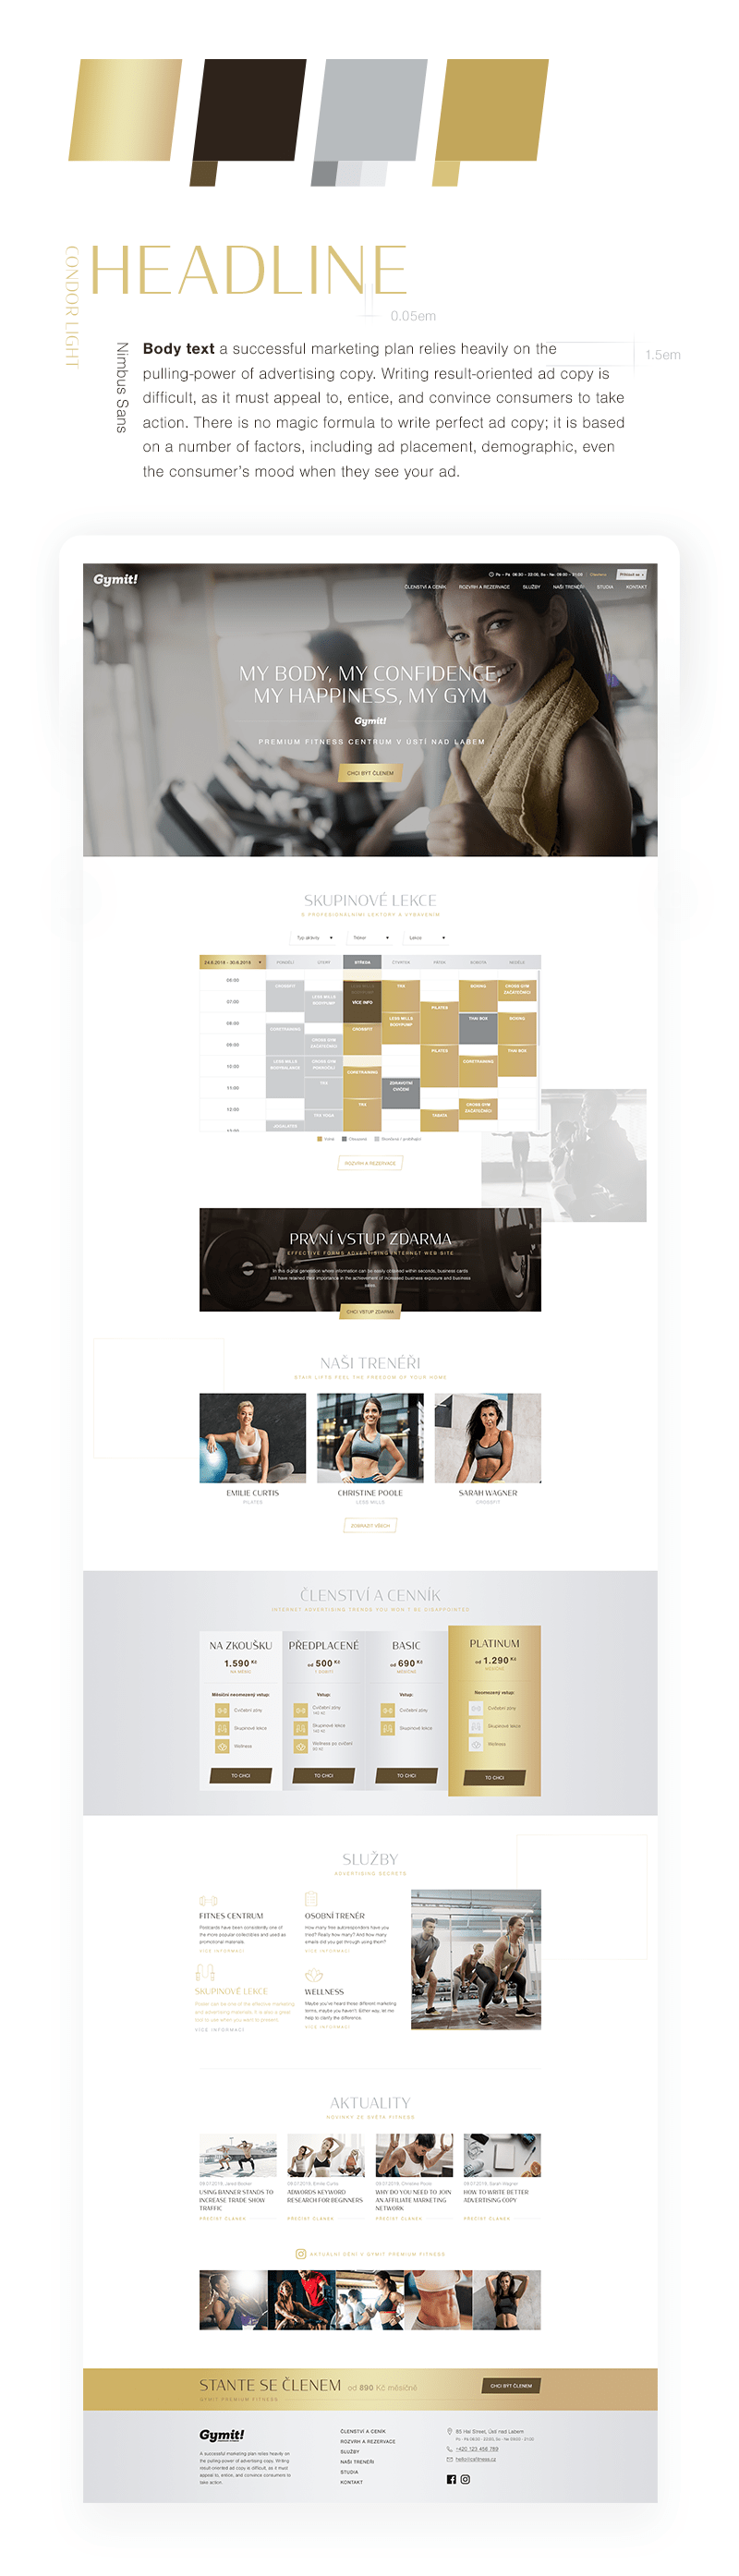 Gymit Homepage